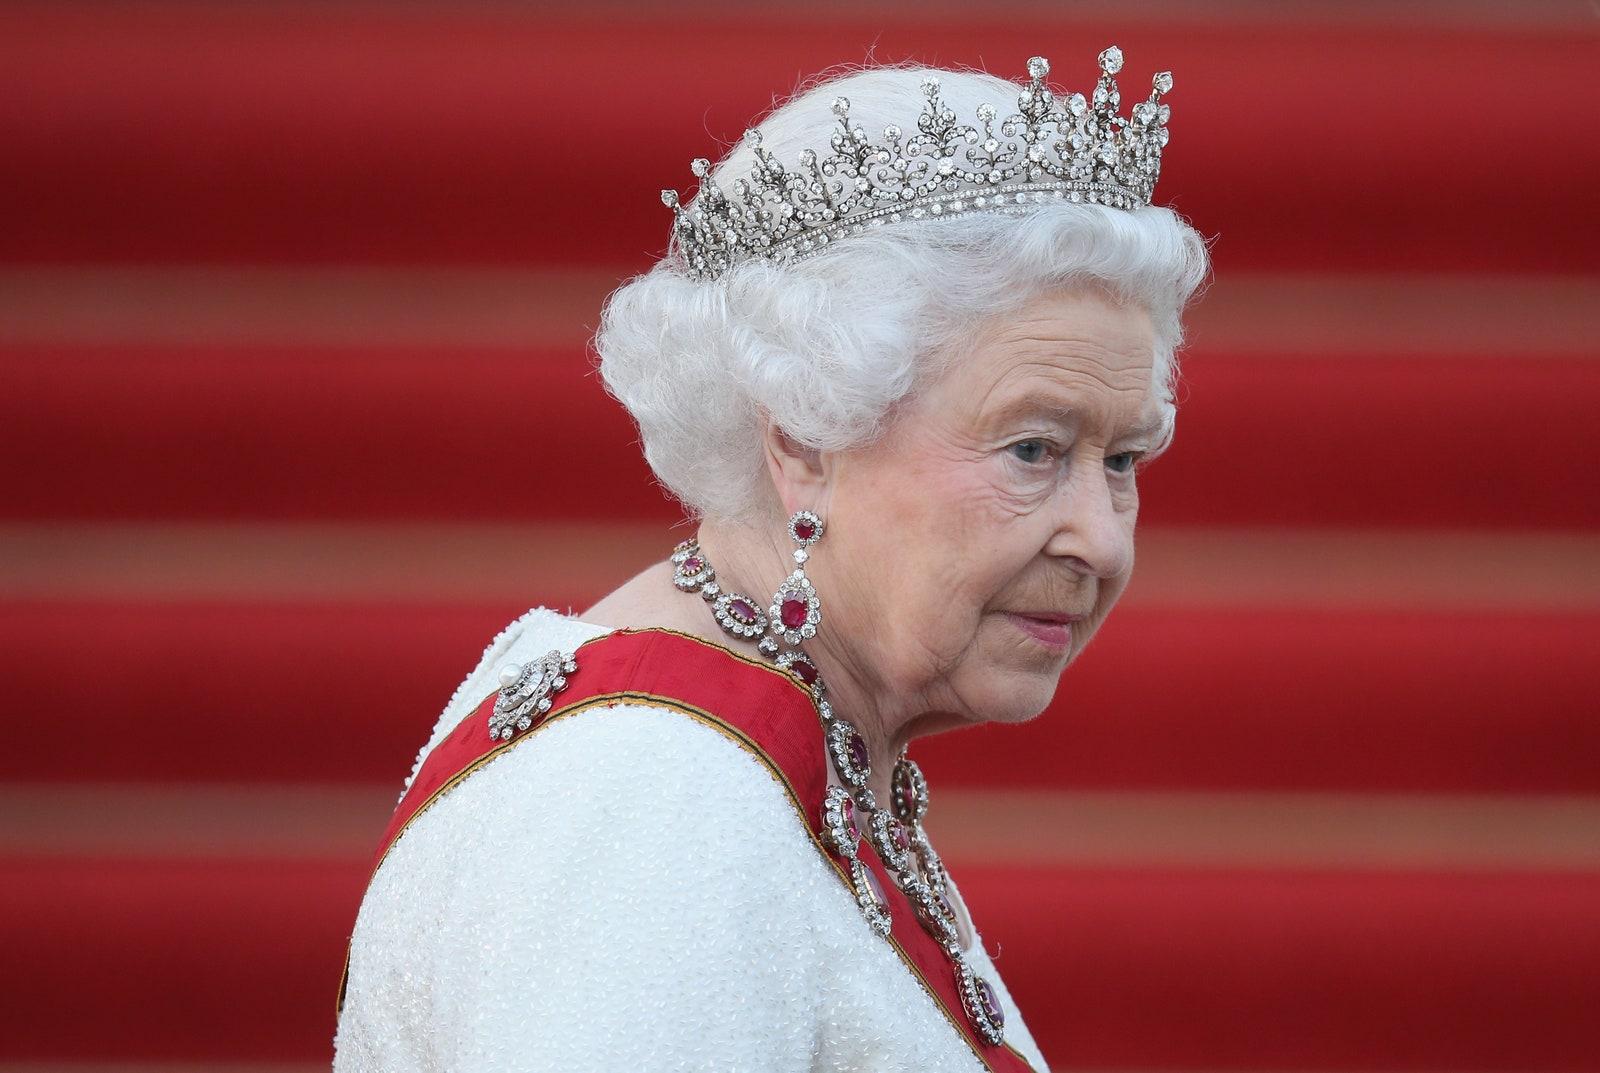 La Reina Isabel II se siente joven